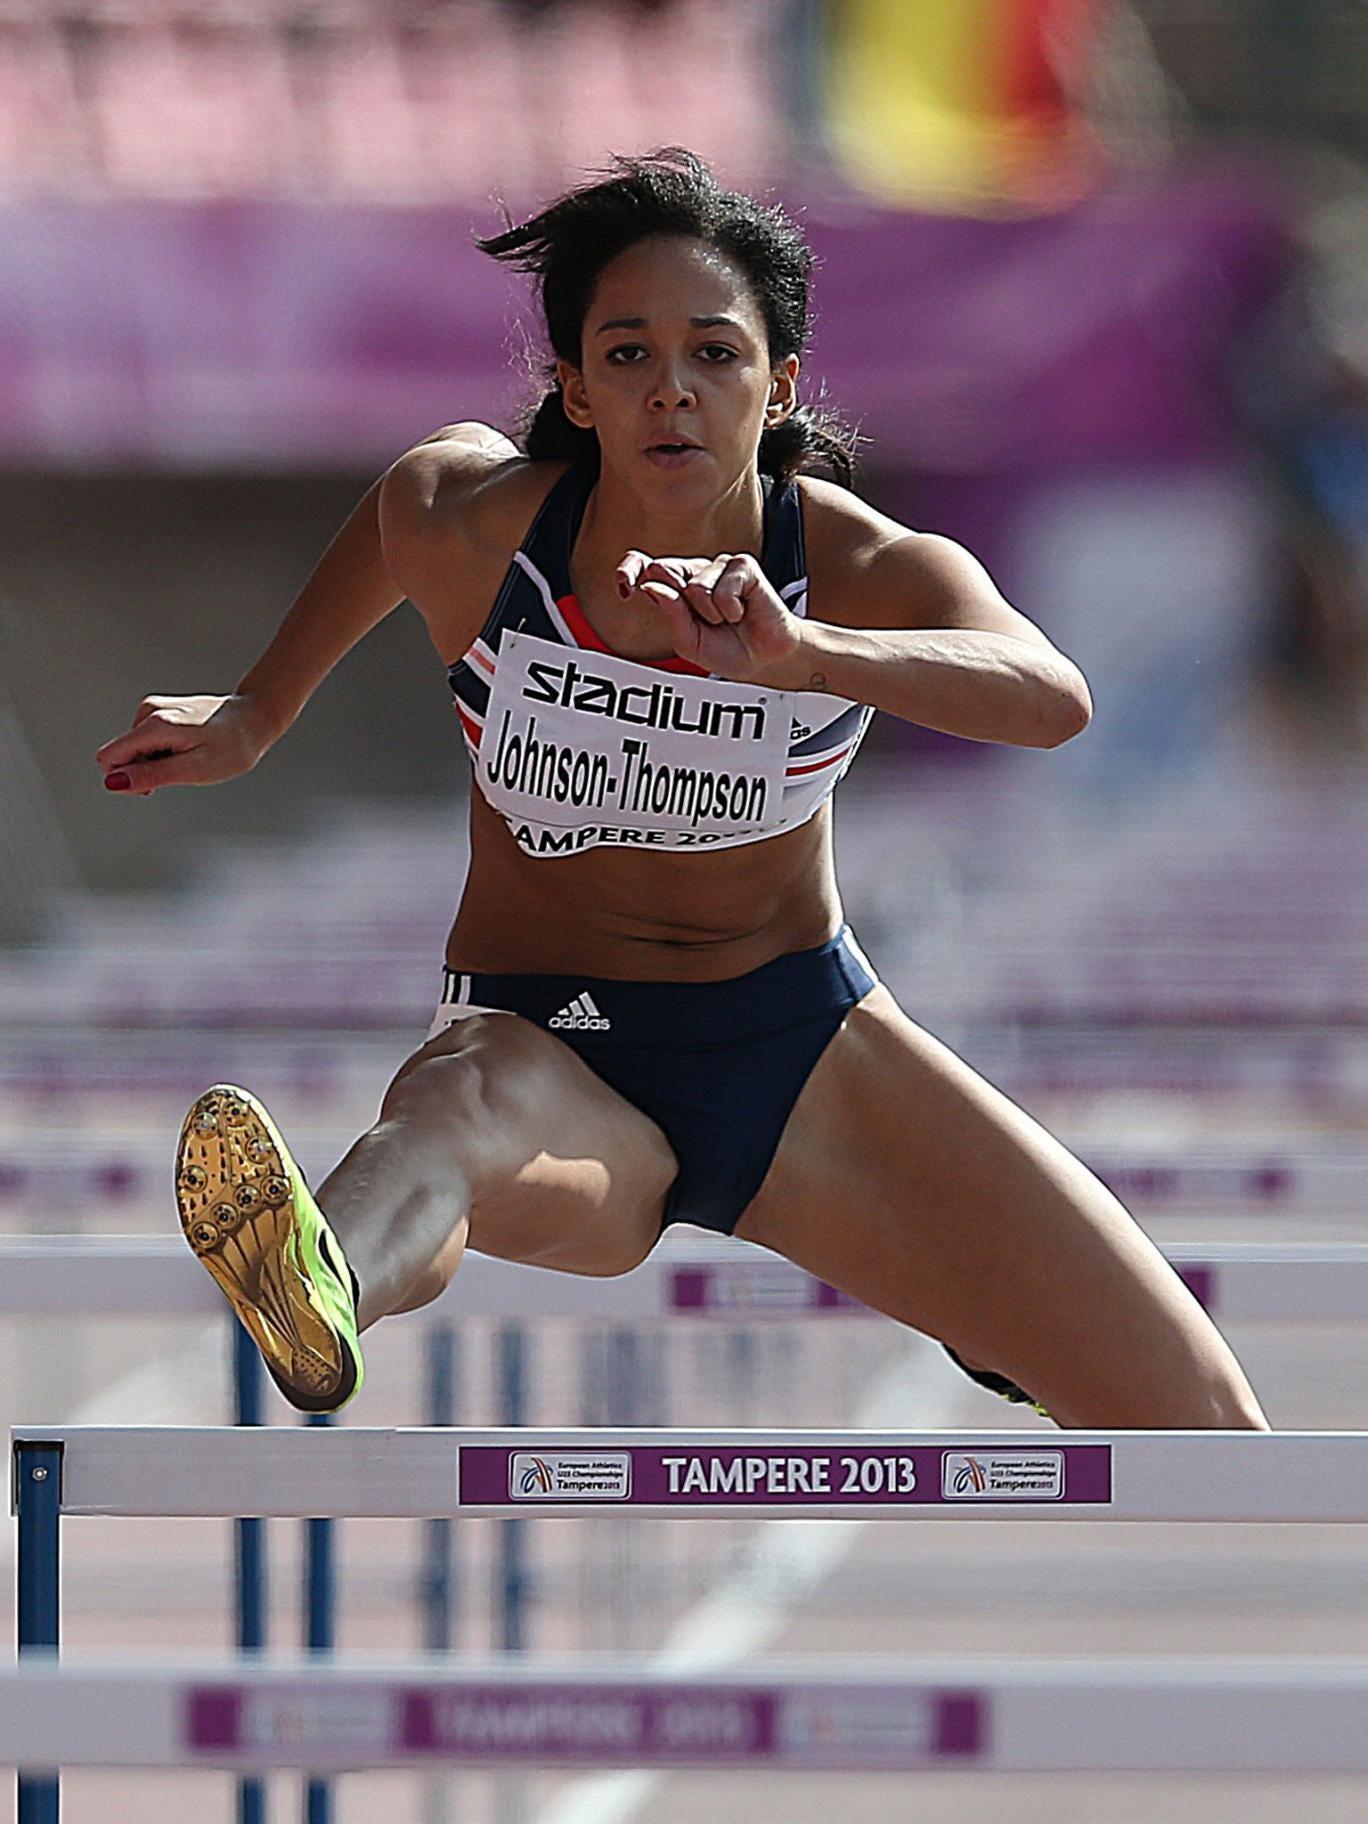 Katarina Johnson-Thompson on her way to victory in the European Under-23 Championship heptathlon in Finland last month